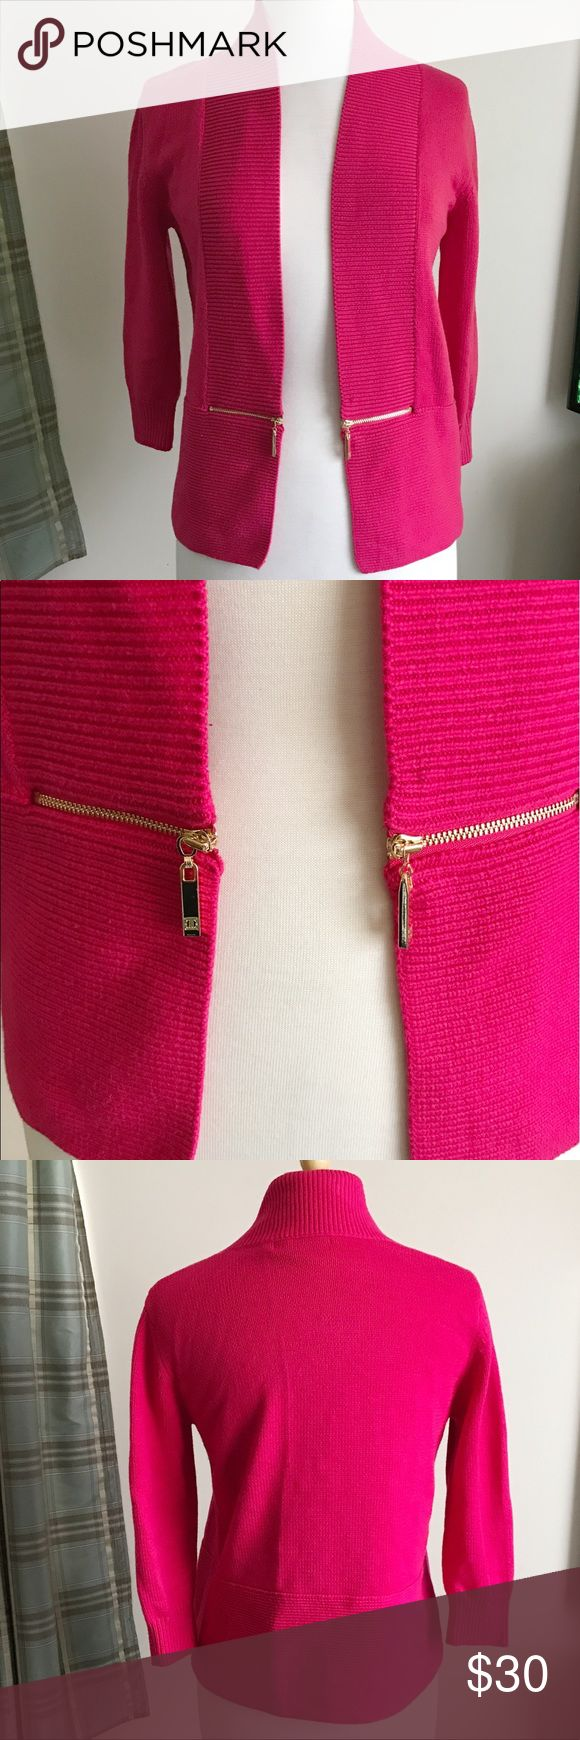 Ivanka Trump Pink Cardigan Sweater Ivanka Trump pink open front cardigan sweater with gold zippers. Size medium. 60% cotton 40% acrylic. Very good condition. Ivanka Trump Sweaters Cardigans